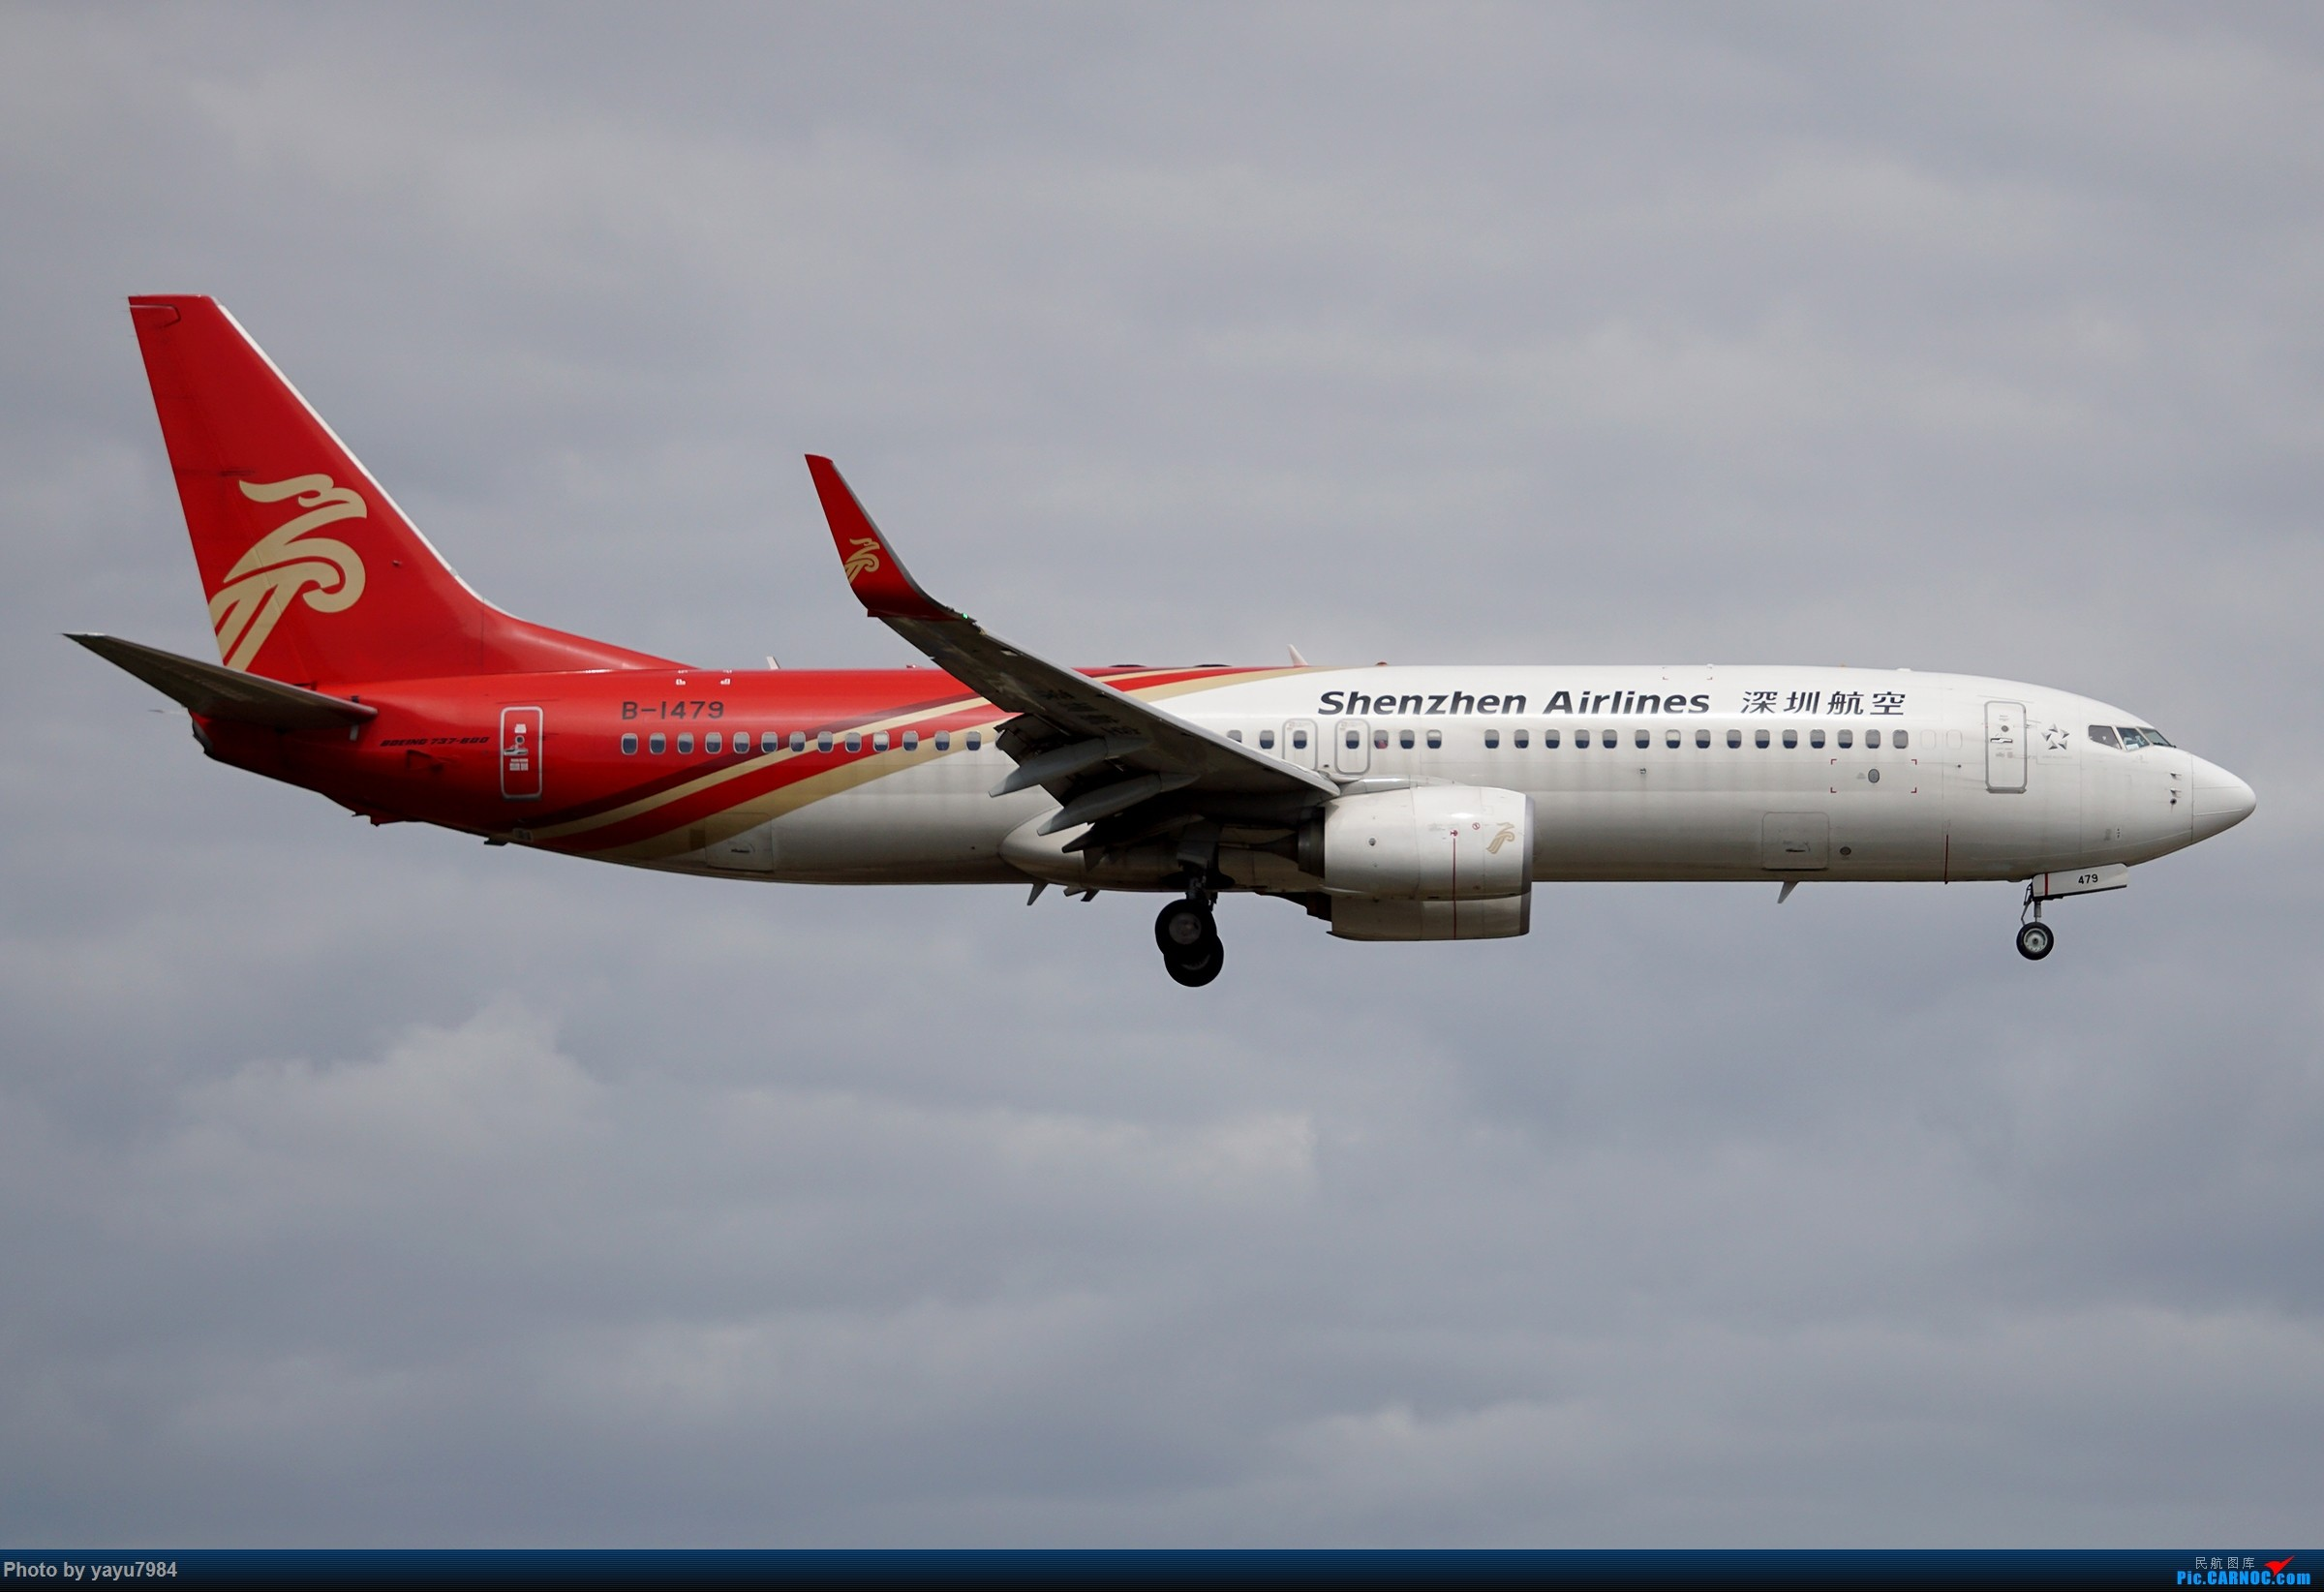 Re:[原创][SYX] 回国首拍,春运高峰时段的三亚凤凰国际机场 BOEING 737-800 B-1479 中国三亚凤凰国际机场